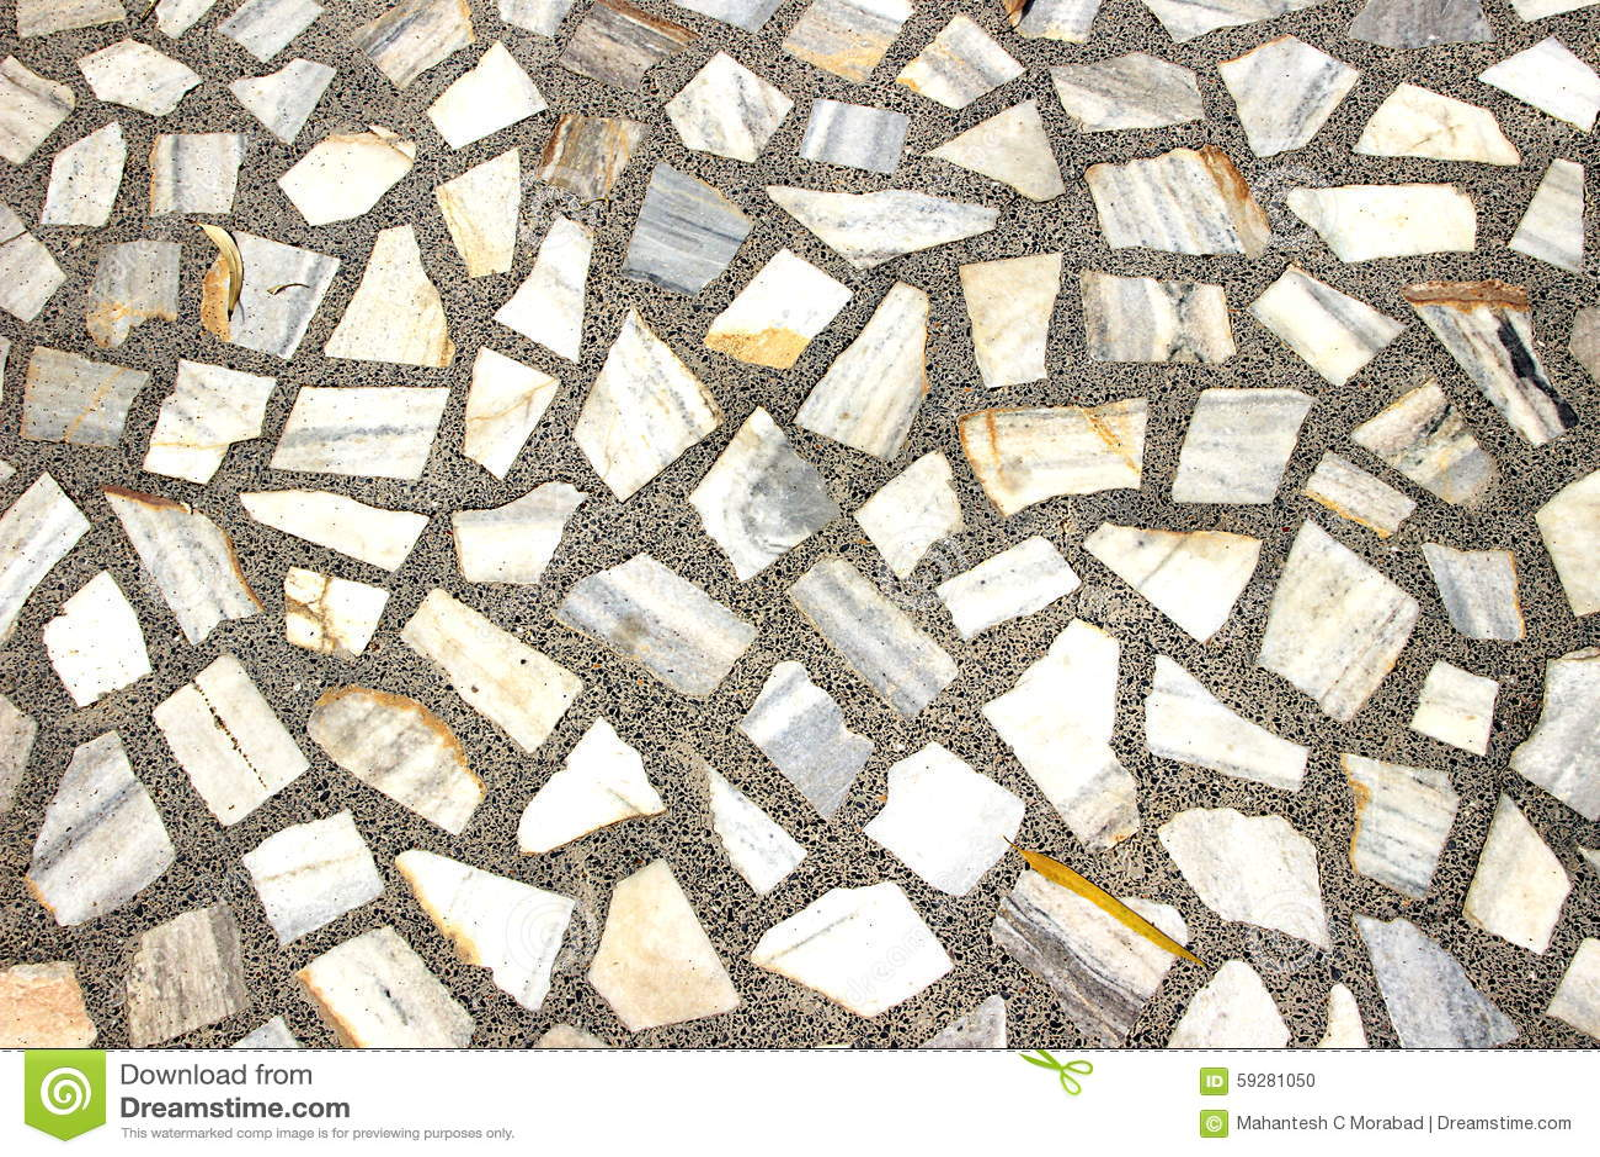 Mosaic Stone Cement : Stone mosaic floor pattern stock photo image